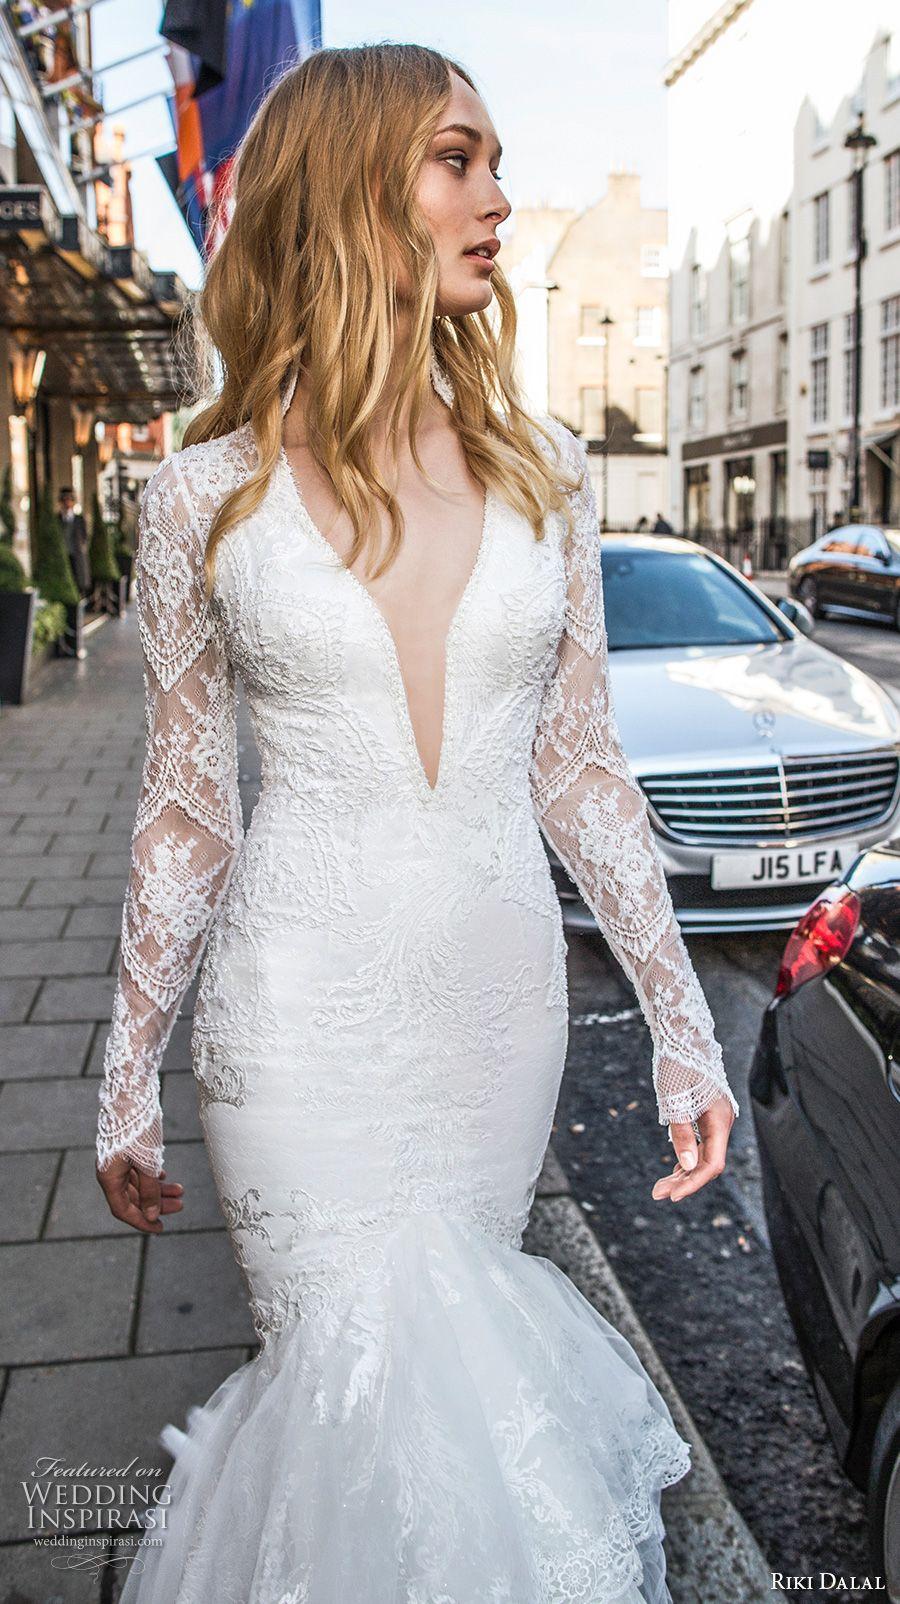 Lace mermaid wedding gowns with long trains  Riki Dalal Fall  Wedding Dresses u ucMayfairud Bridal Collection